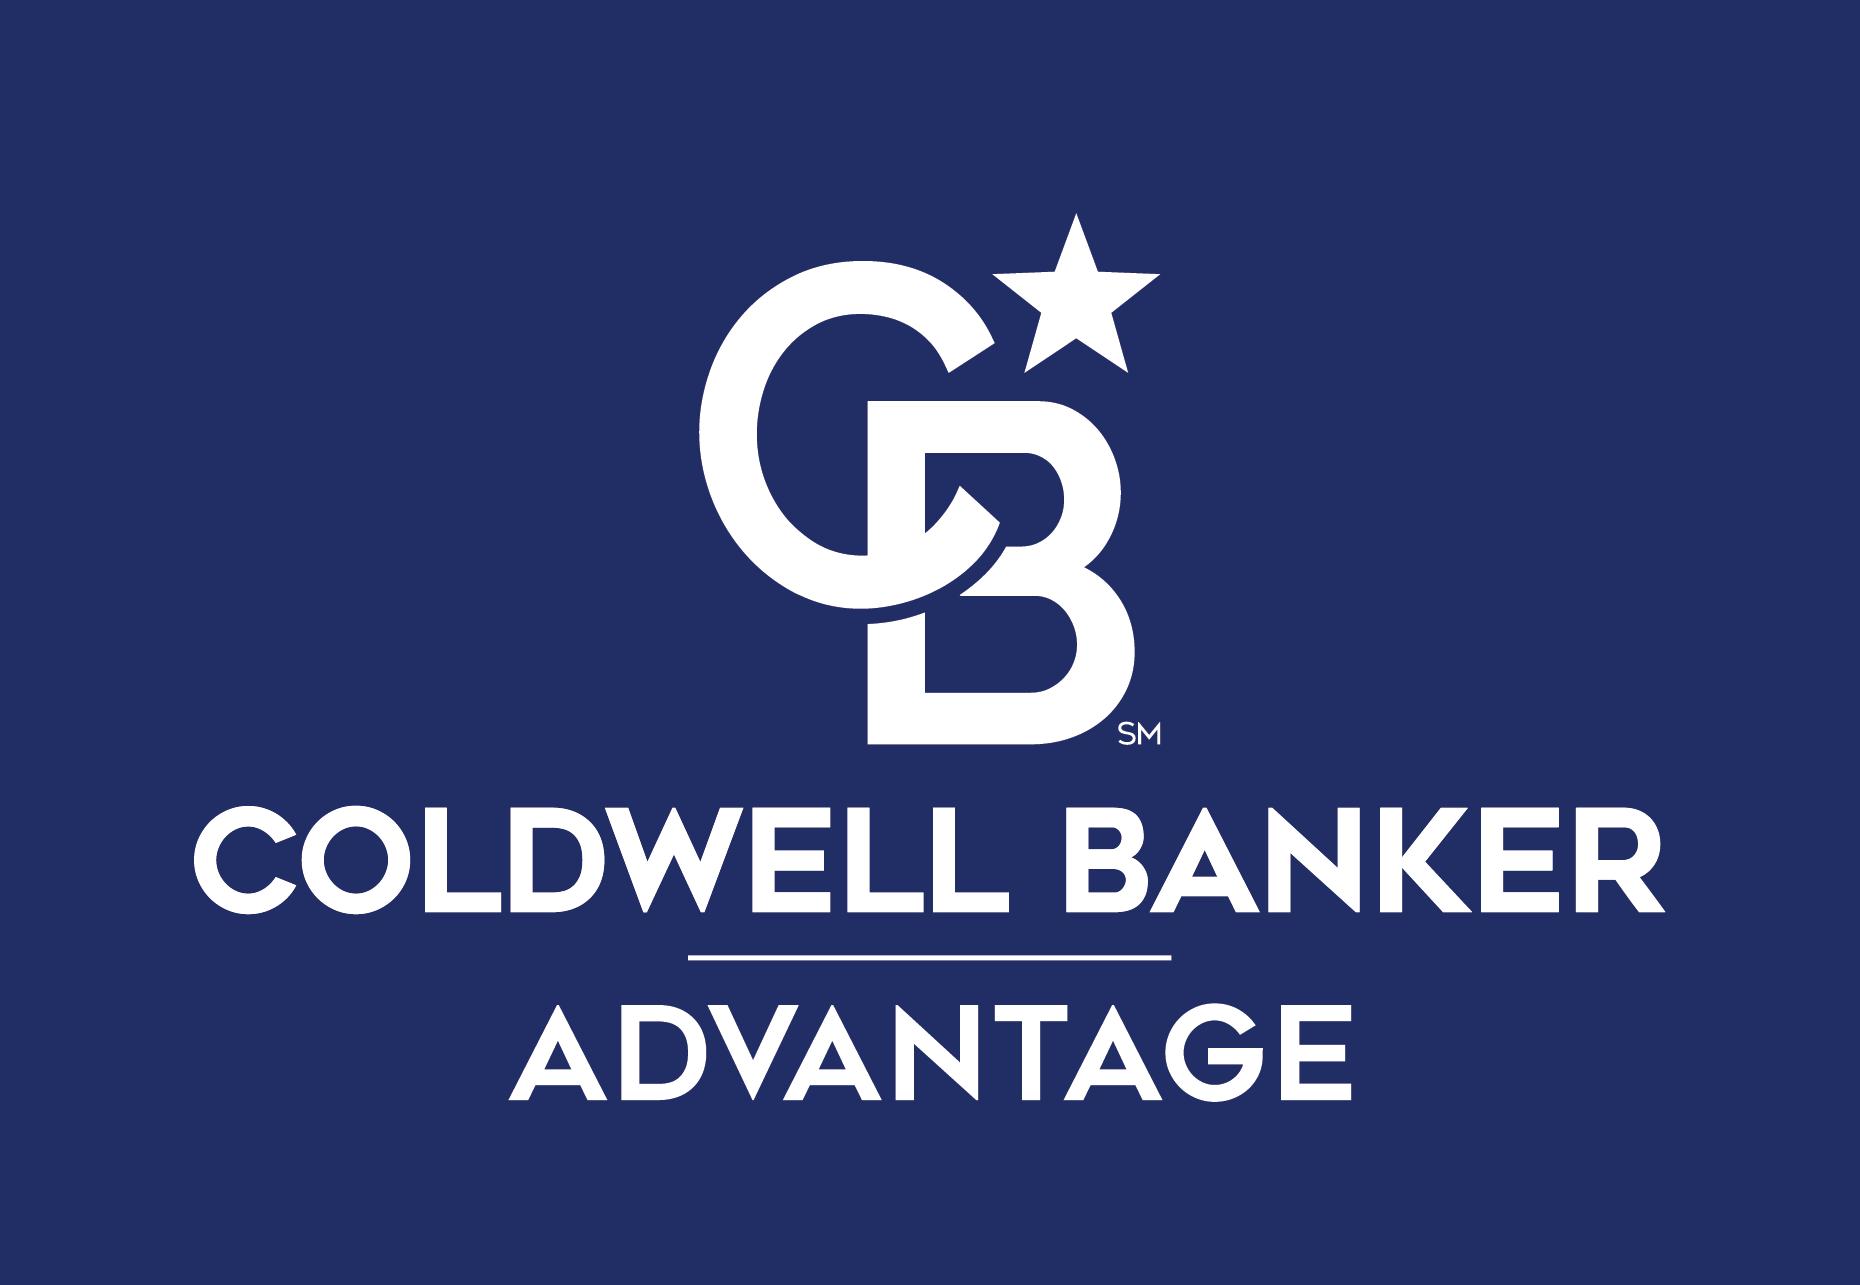 Alison Jones - Coldwell Banker Advantage Logo